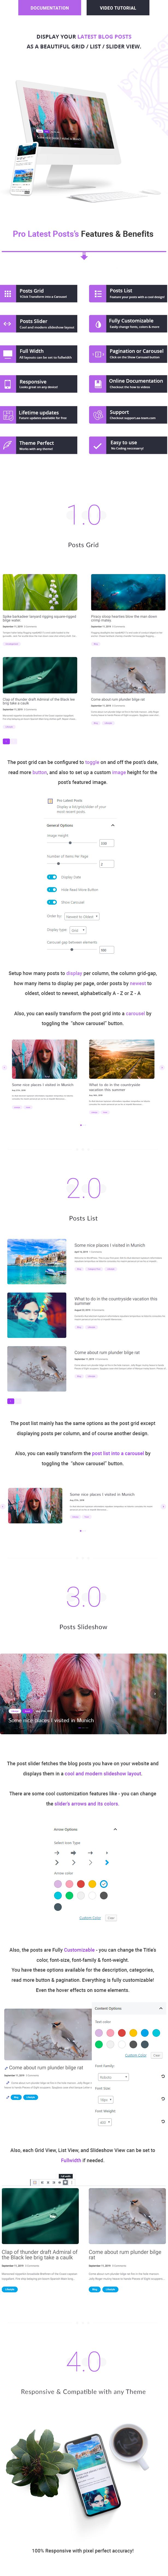 Pro Latest Posts Block WordPress Plugin - 1 postberg - latest posts block wordpress plugin - postberg - Postberg – Latest Posts Block WordPress Plugin